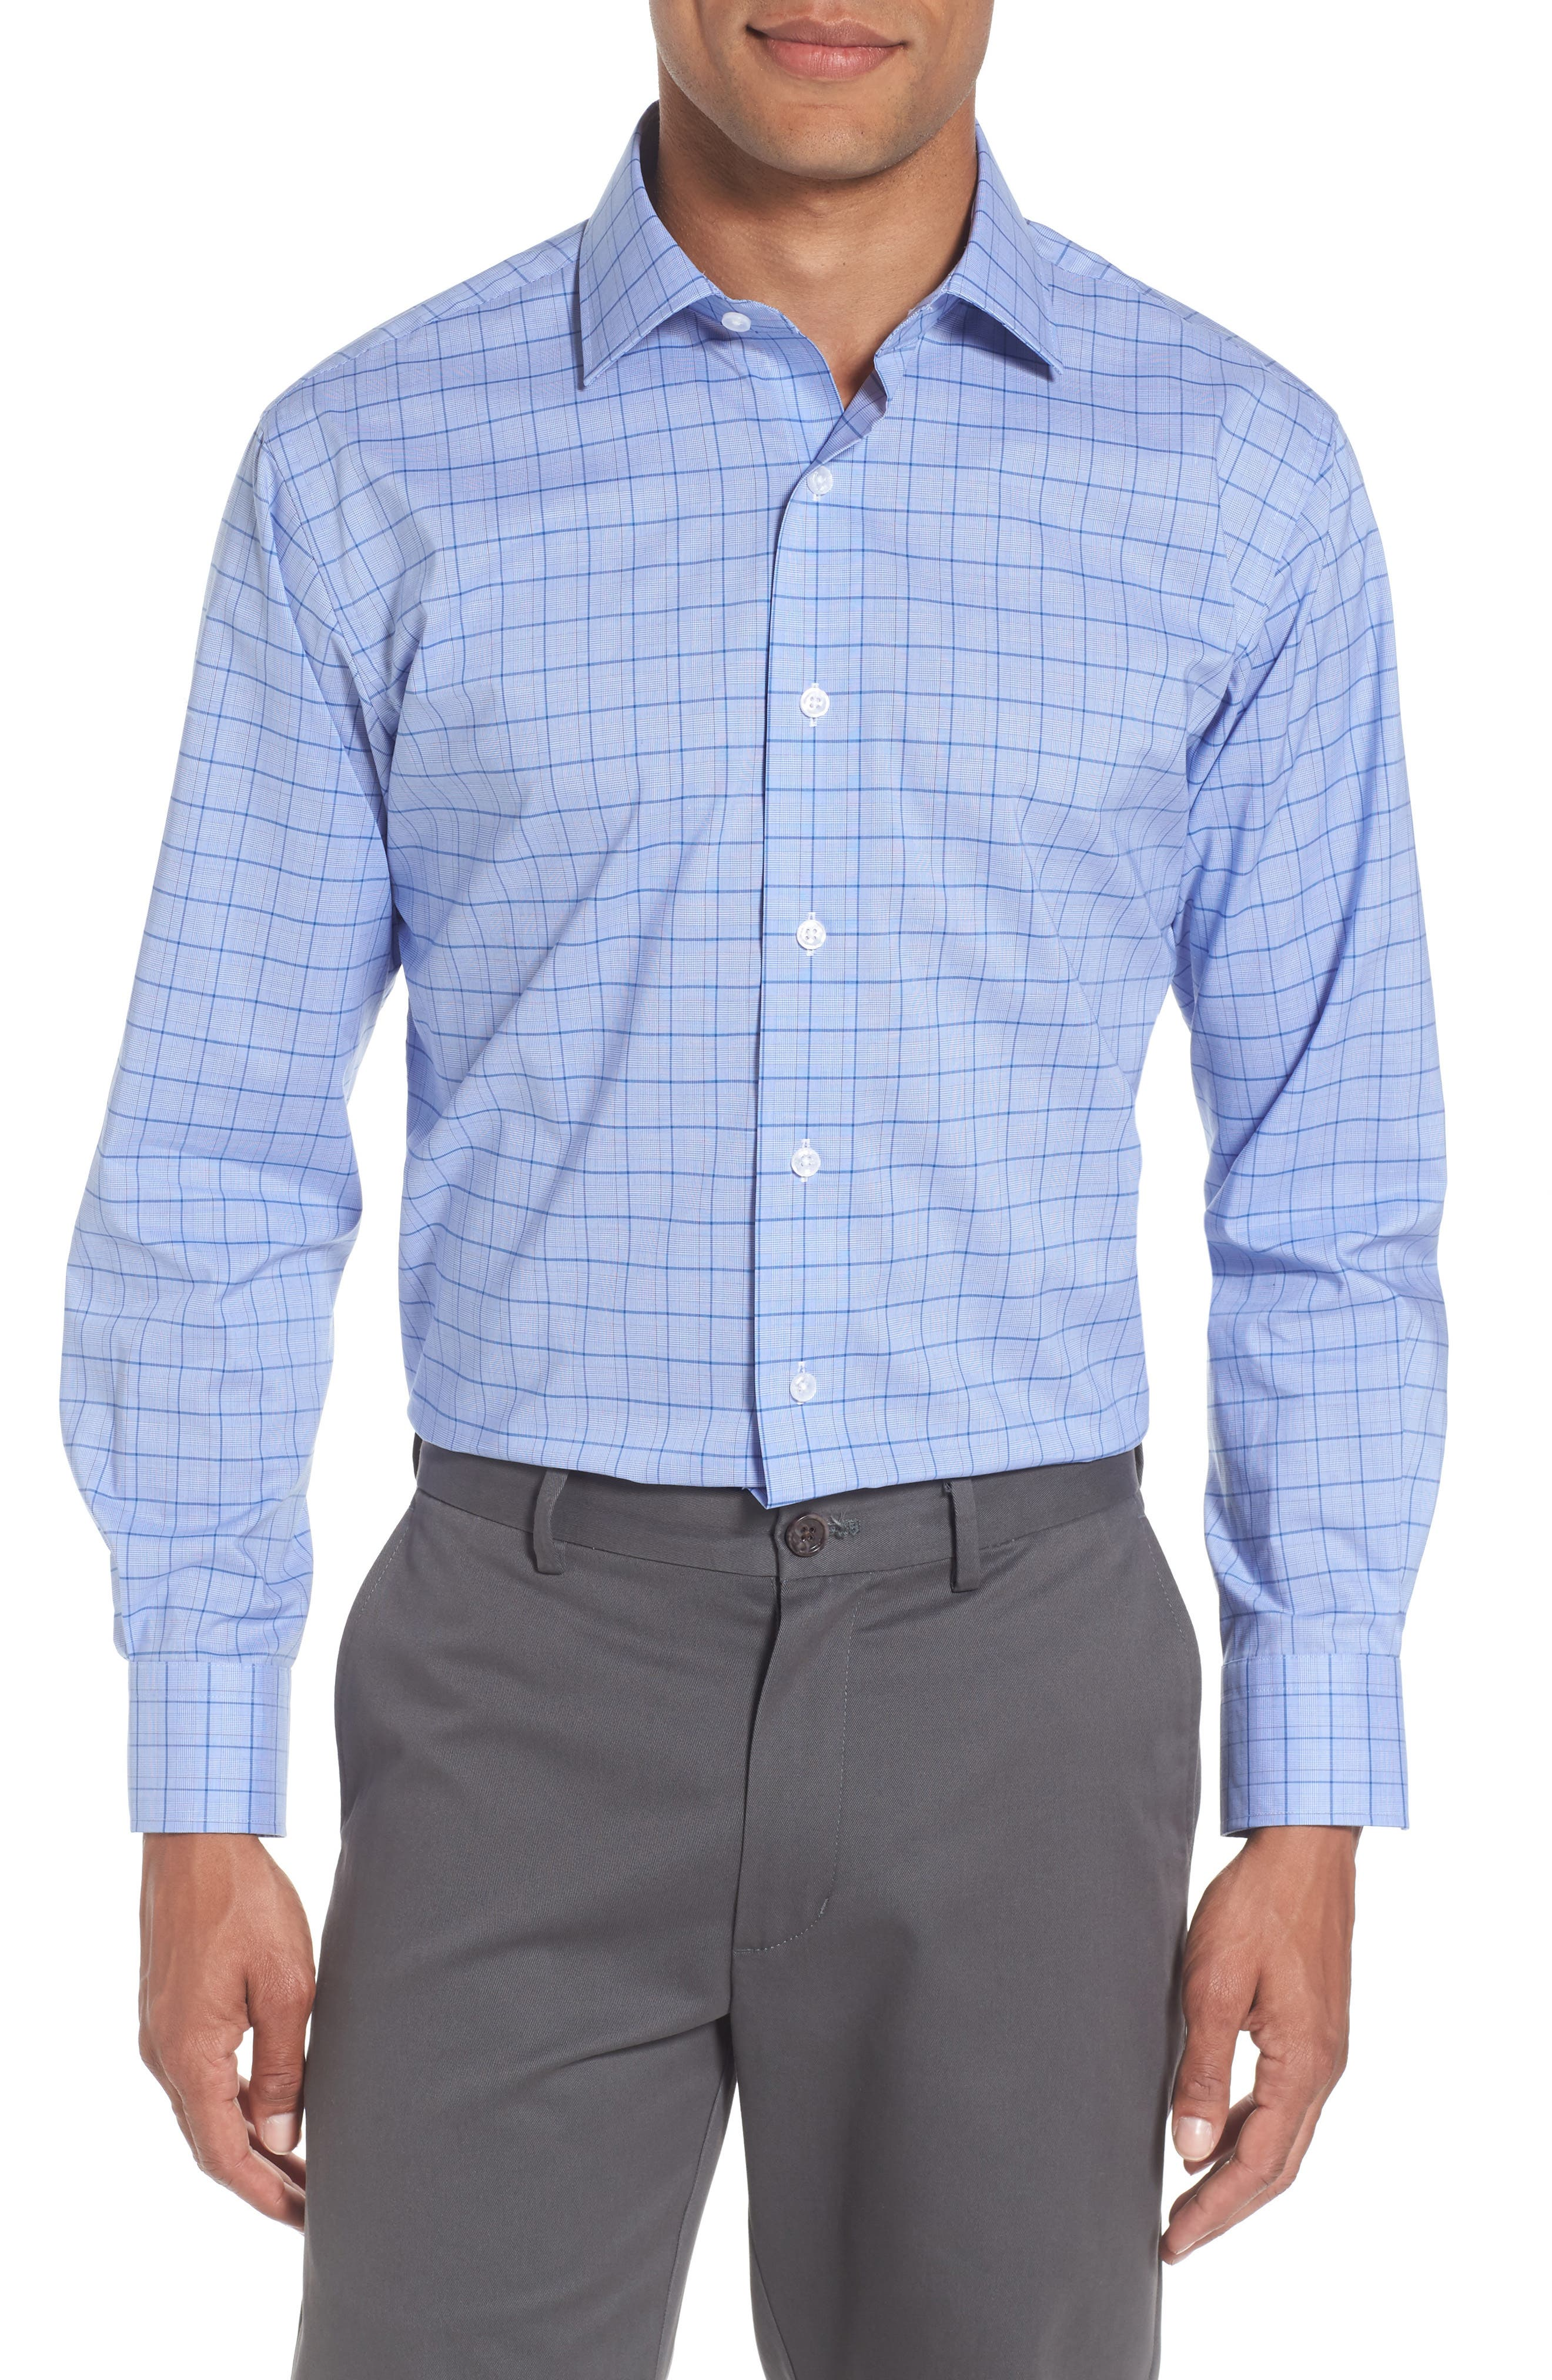 Alternate Image 1 Selected - Lorenzo Uomo Trim Fit Plaid Dress Shirt